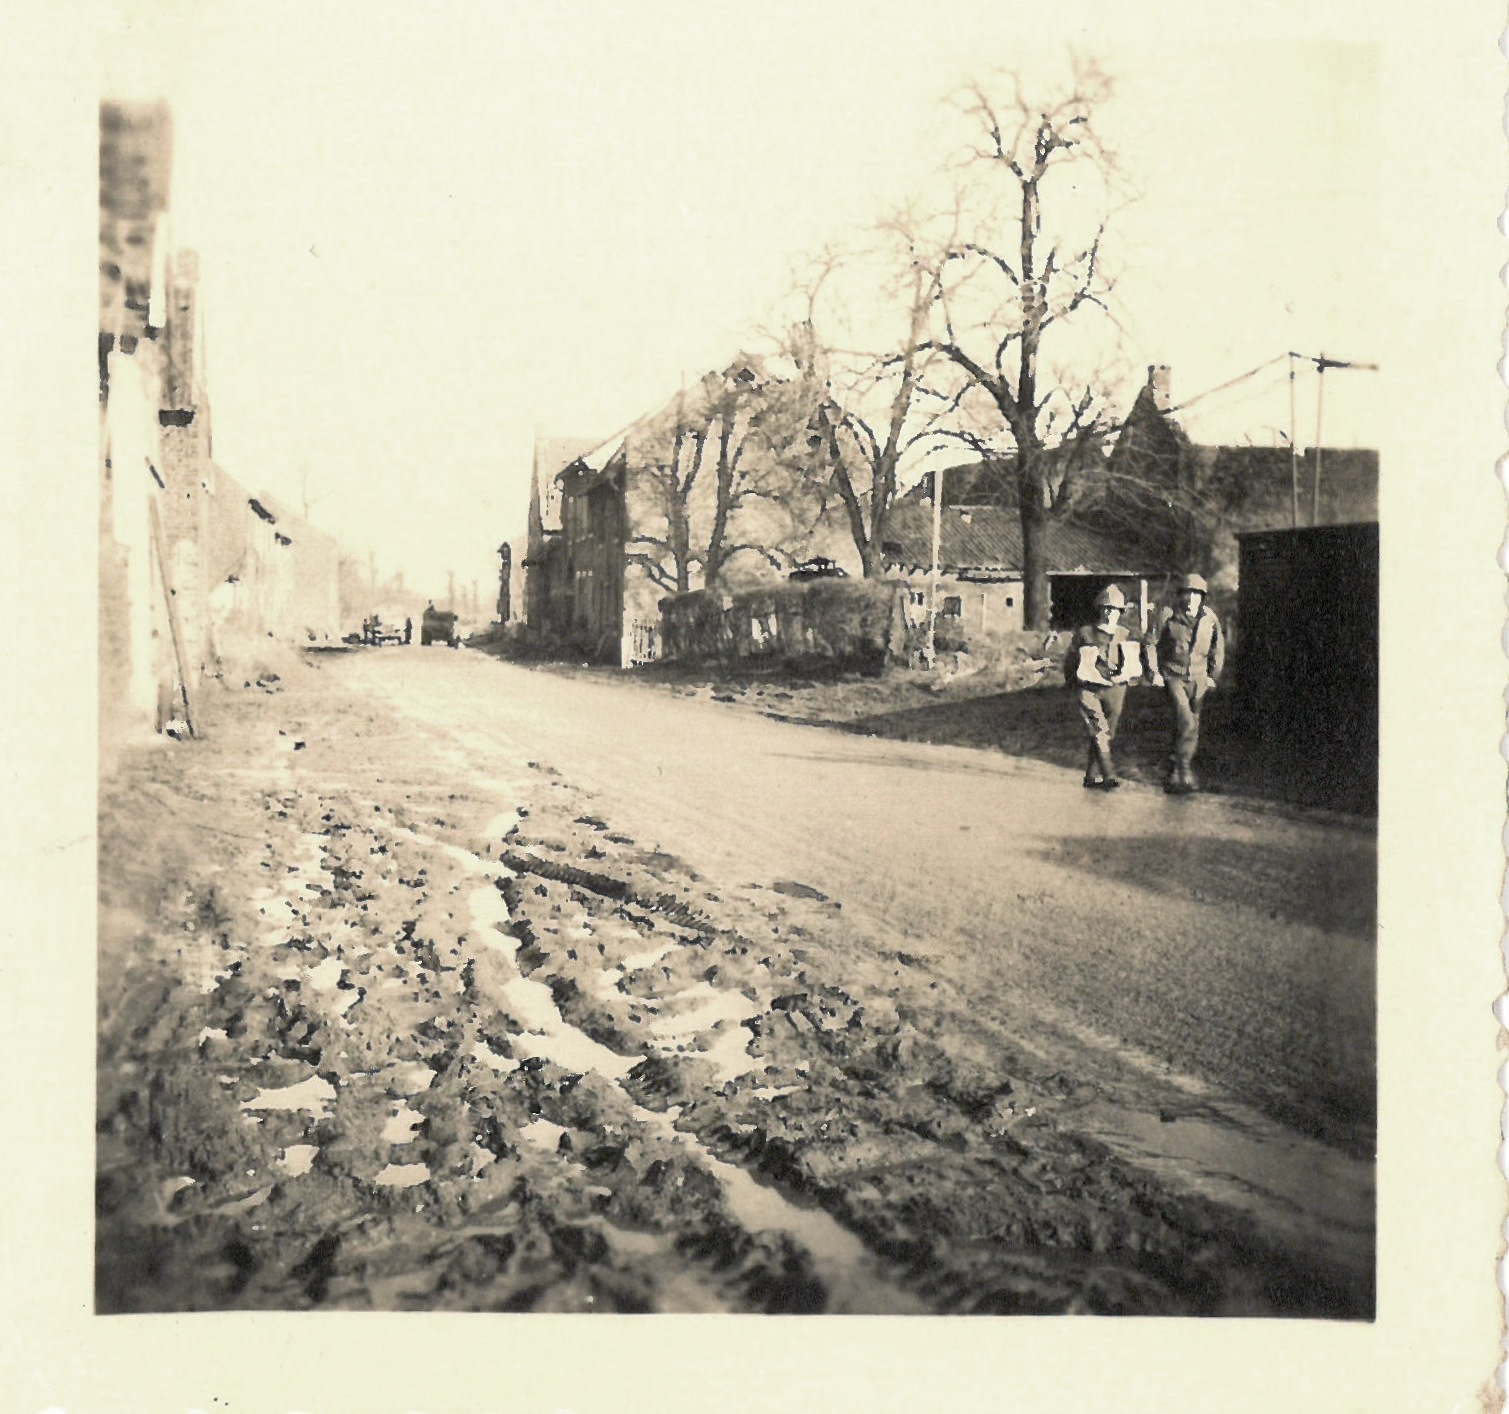 1945 'Bettendorf, Ger.